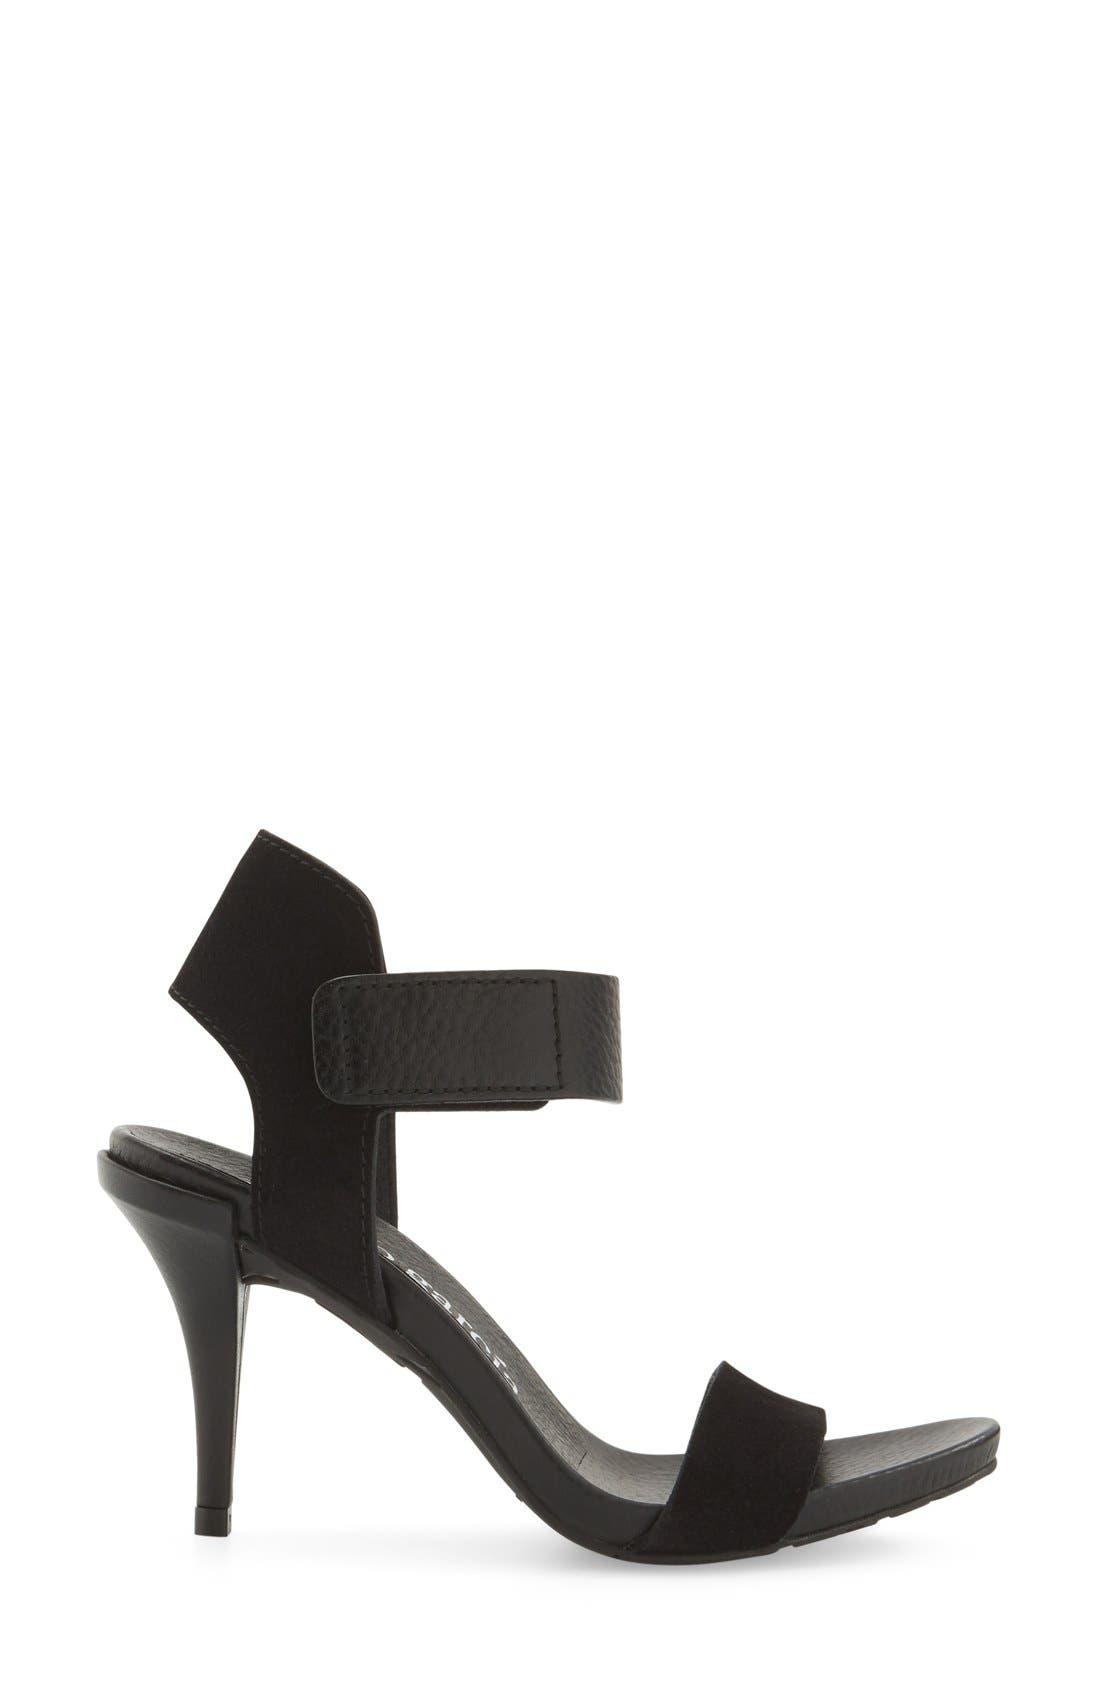 Yola Sandal,                             Alternate thumbnail 4, color,                             Black Leather